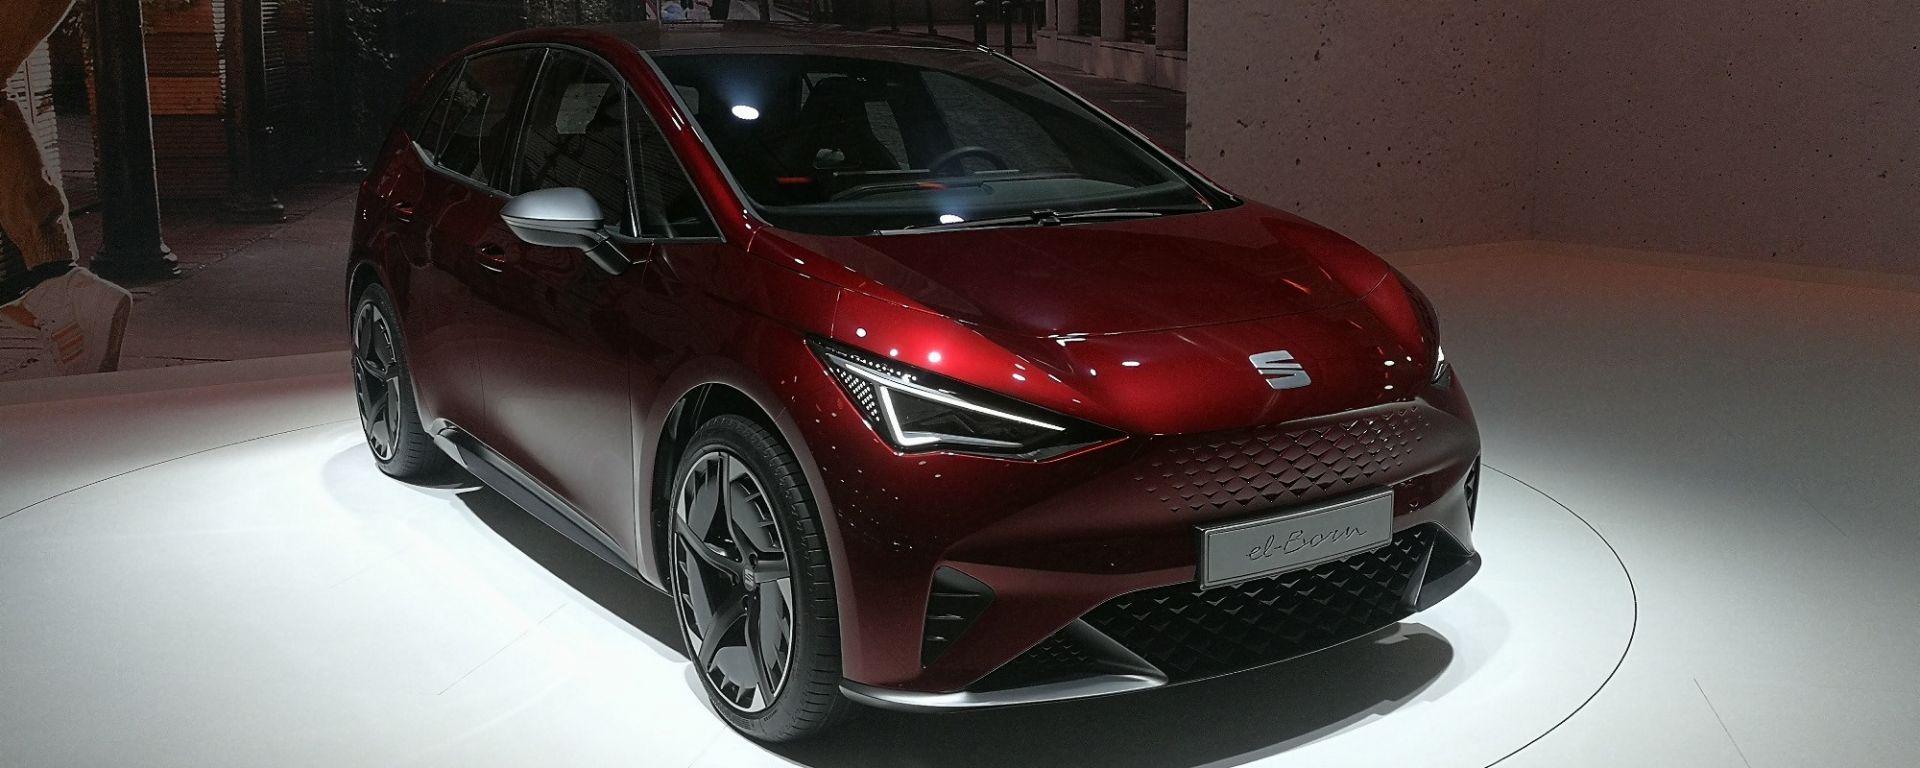 Da Volkswagen Group 35 modelli elettrificati in arrivo